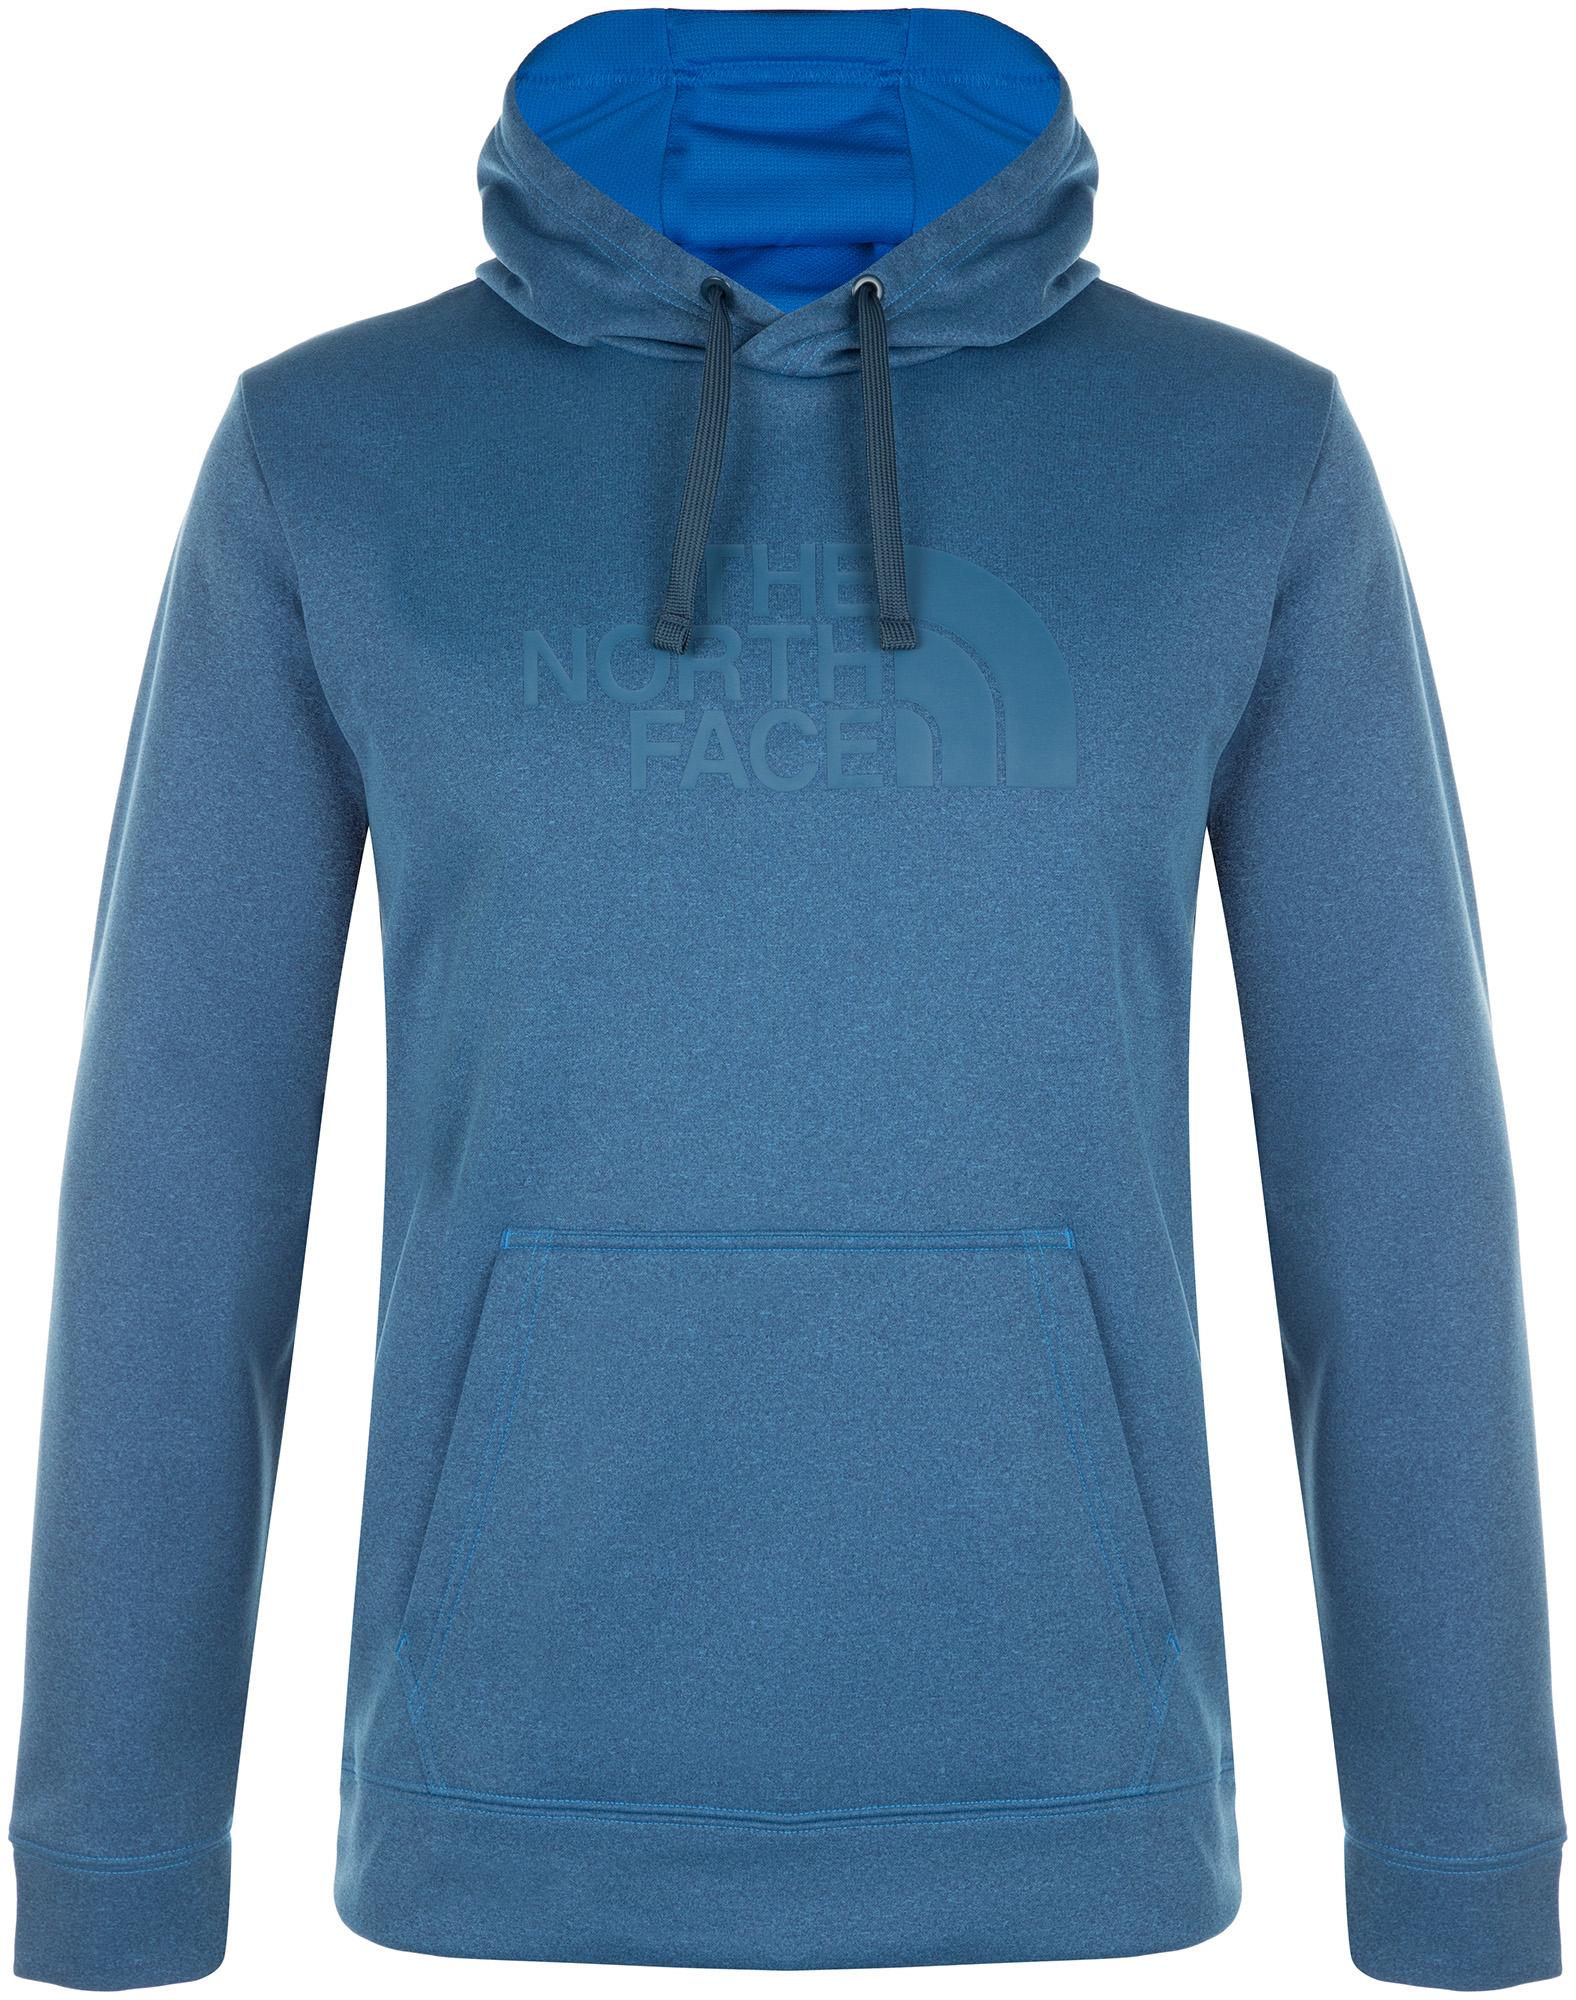 цена на The North Face Худи мужская The North Face Surgent, размер 52-54